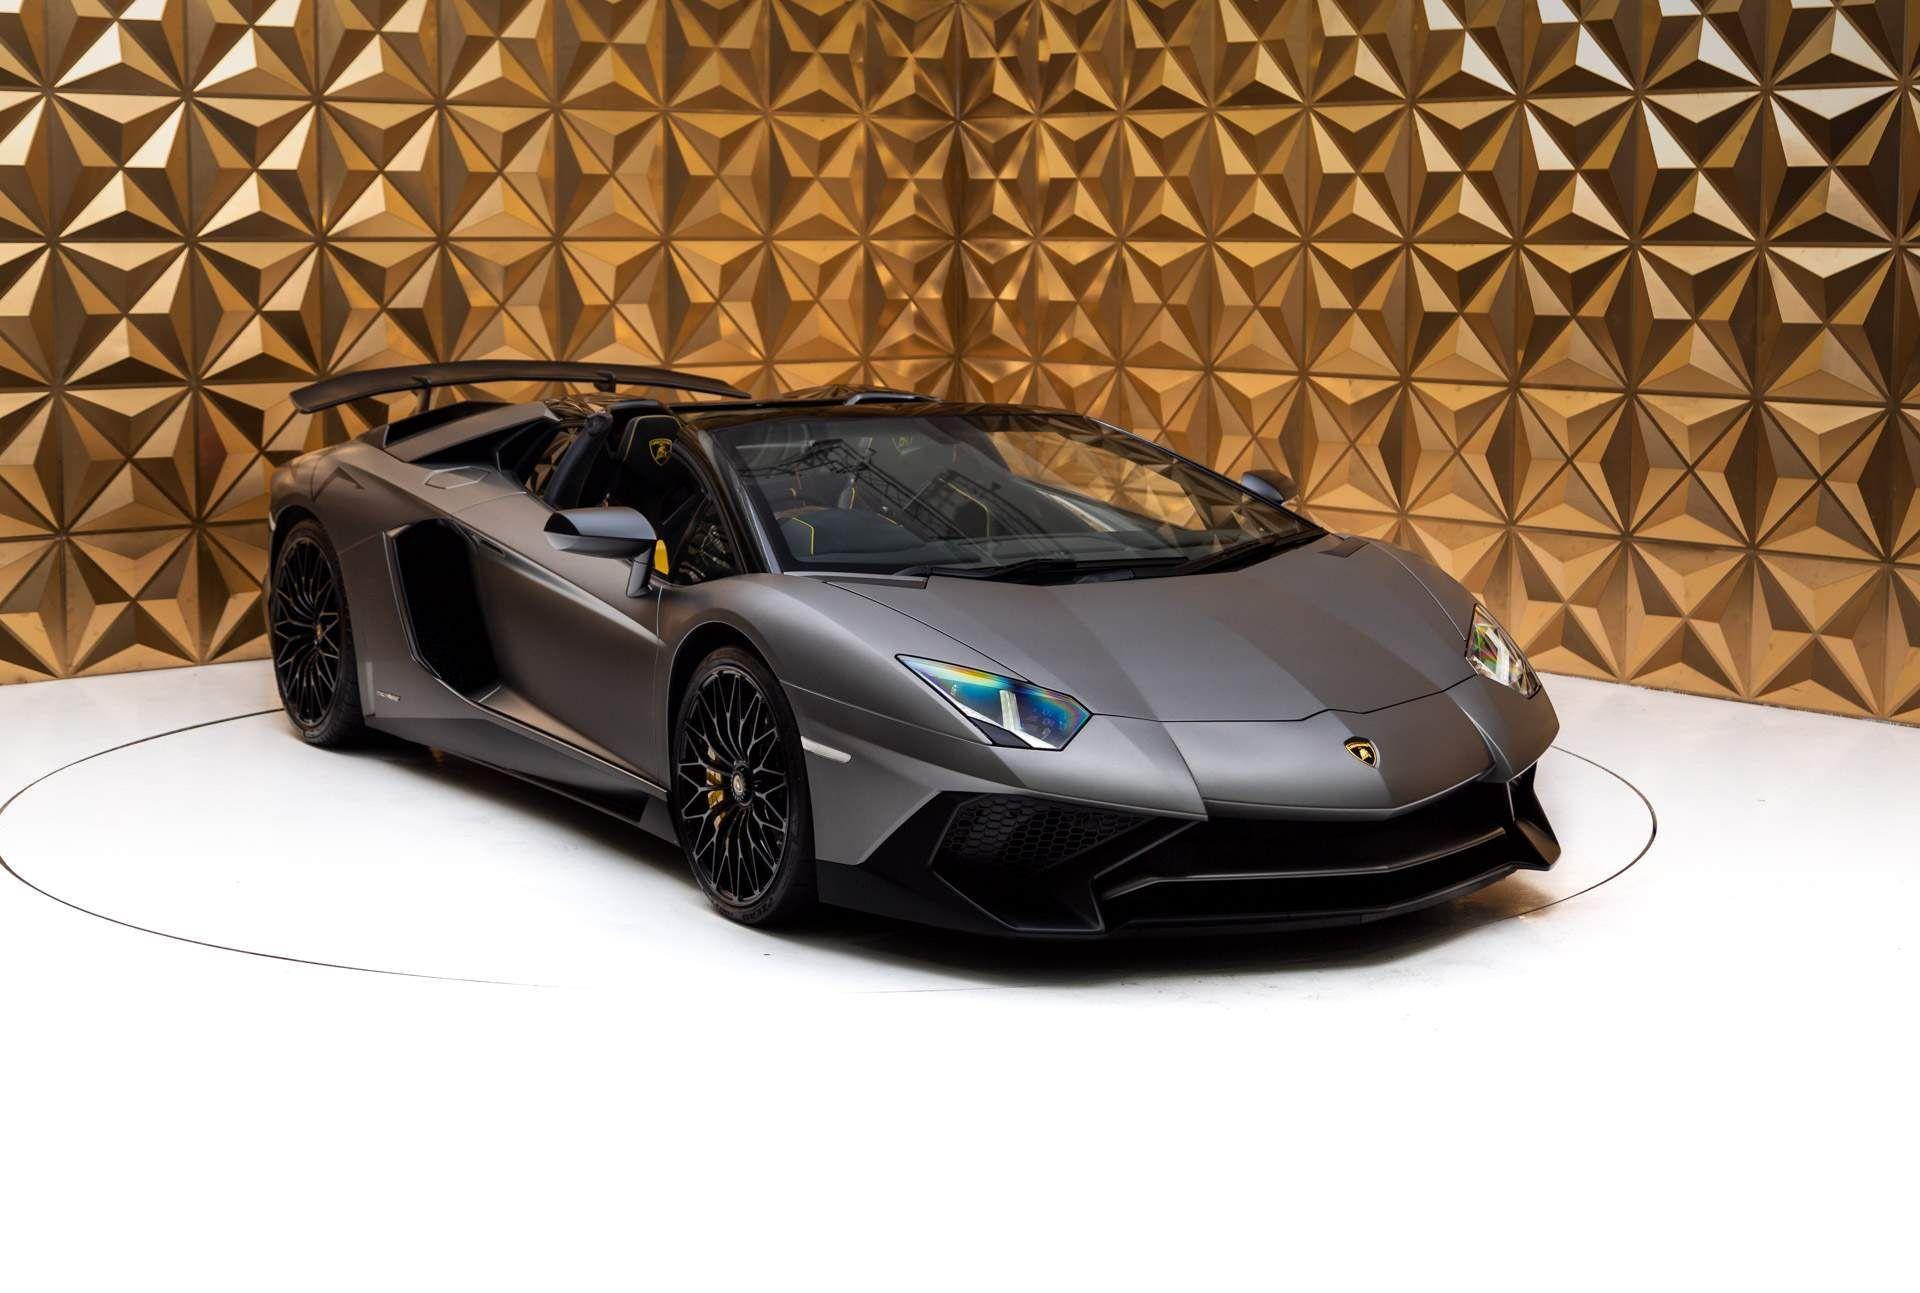 Petrol Lamborghini Aventador Convertible Used Cars For Sale Autotrader Uk